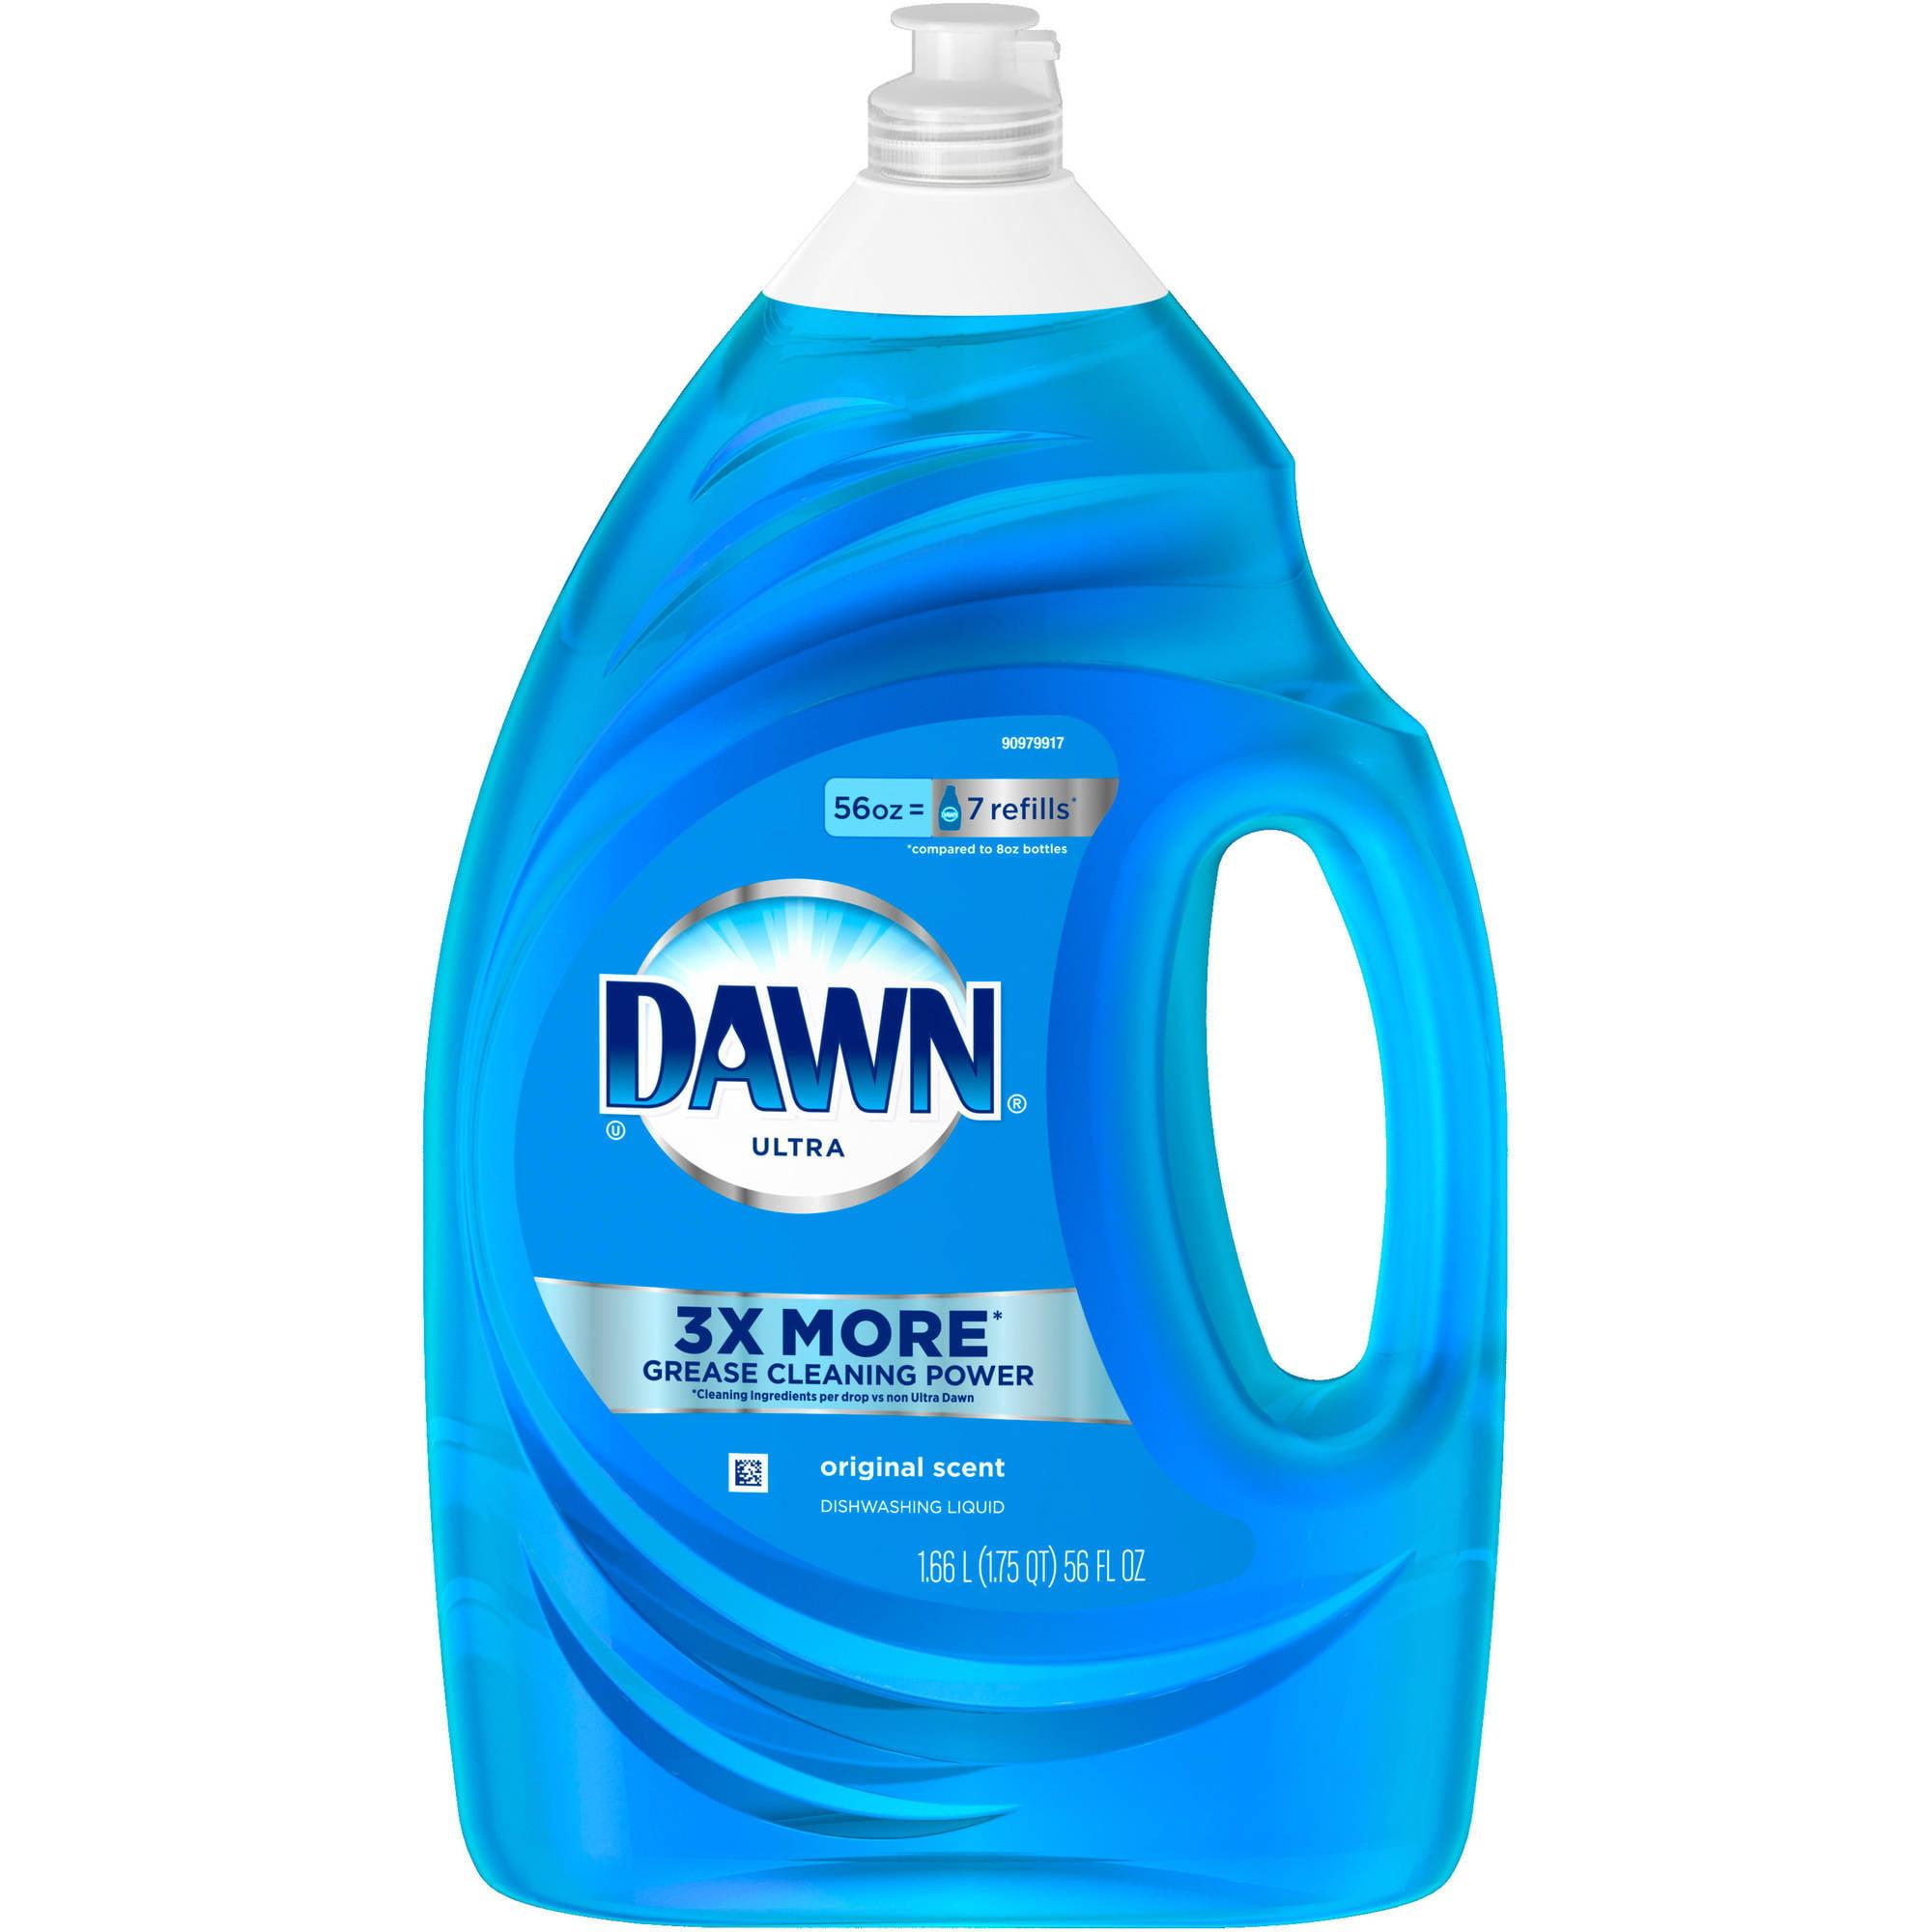 Dawn Ultra Dishwashing Liquid Original Scent (choose your size)